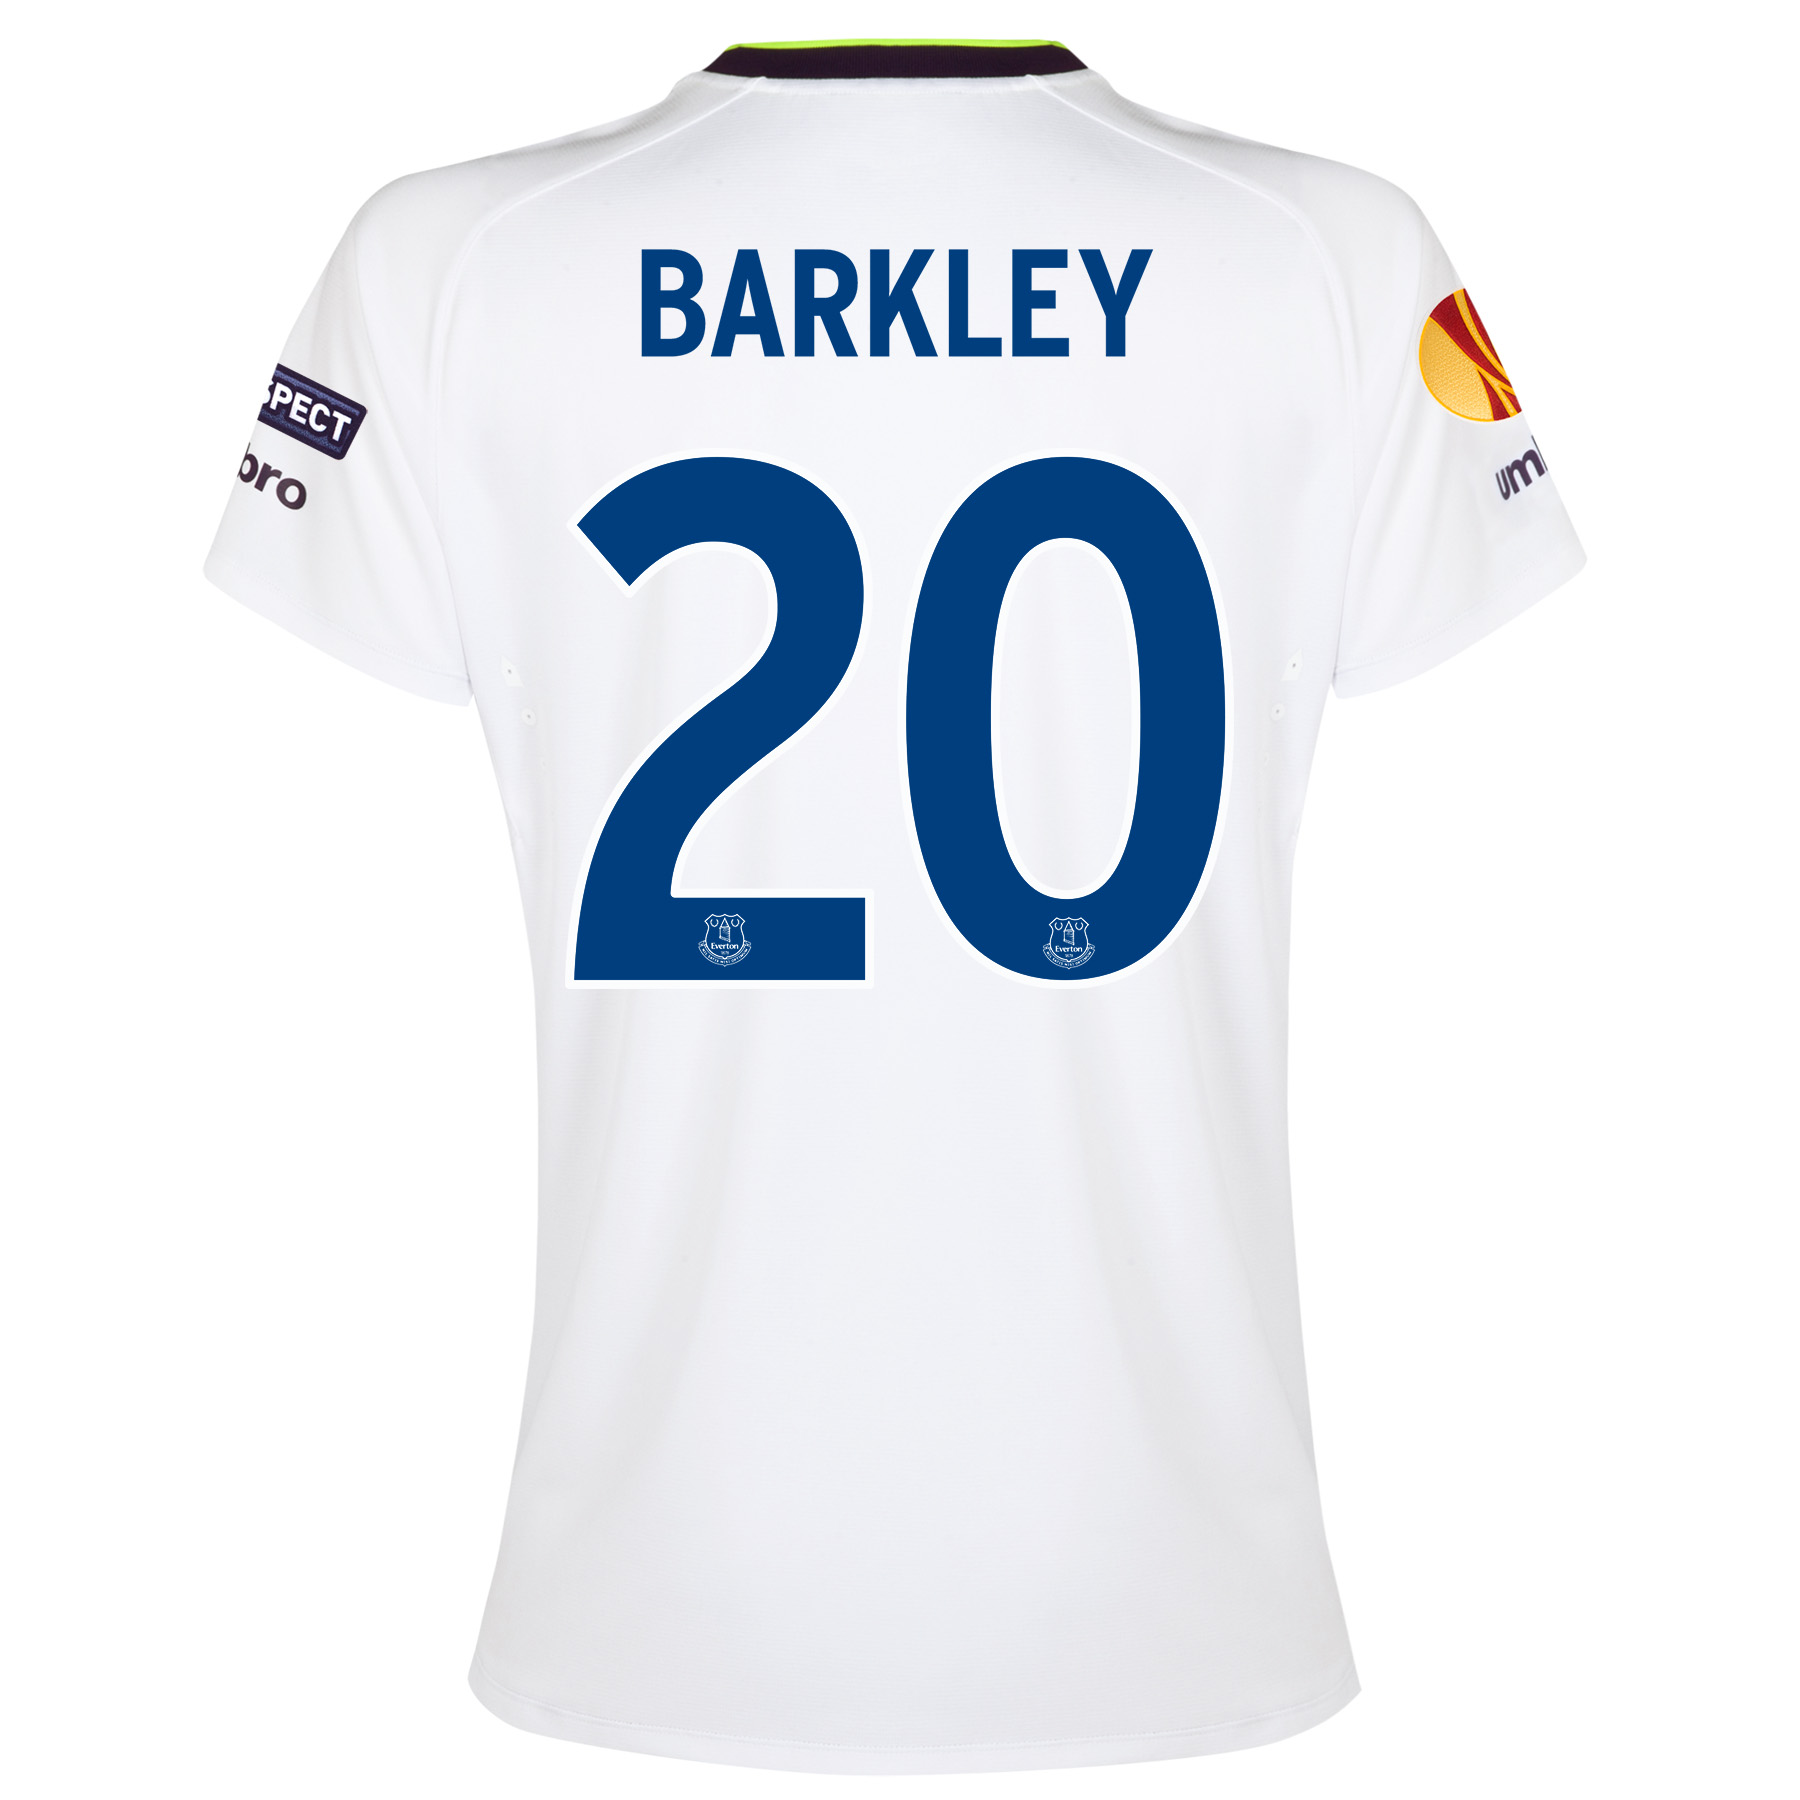 Everton UEFA Europa League 3rd Shirt 2014/15 - Womens with Barkley 20